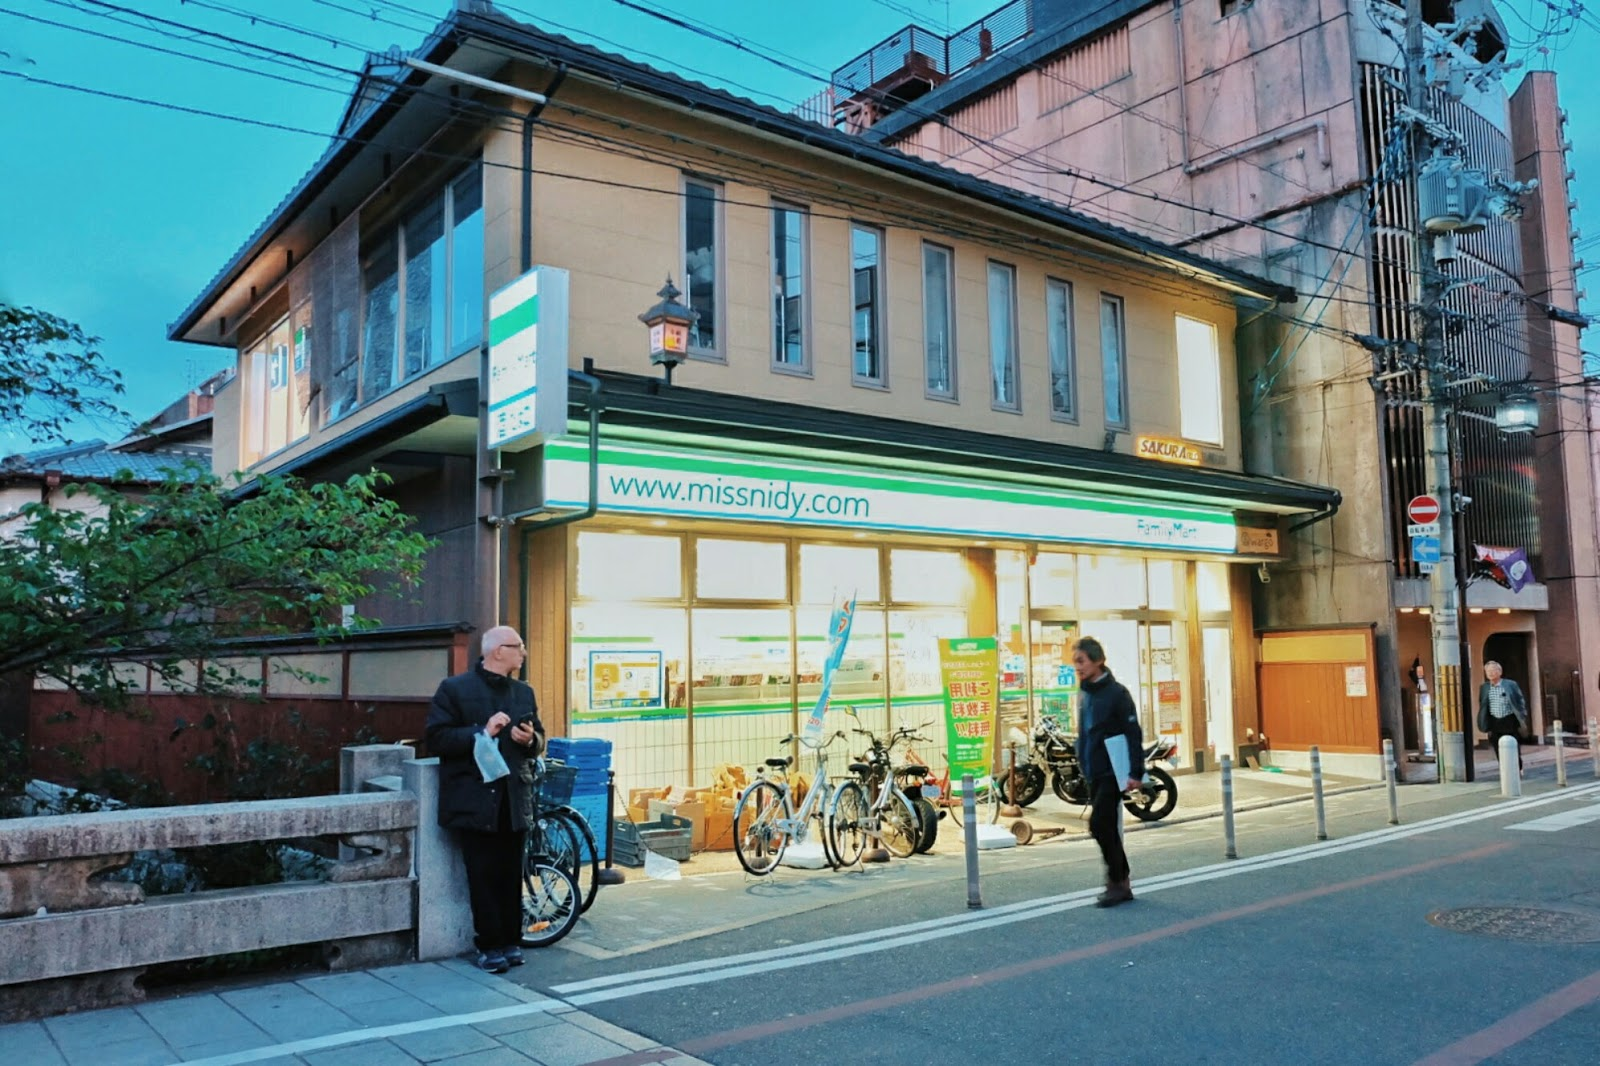 tempat sewa kimono murah di kyoto